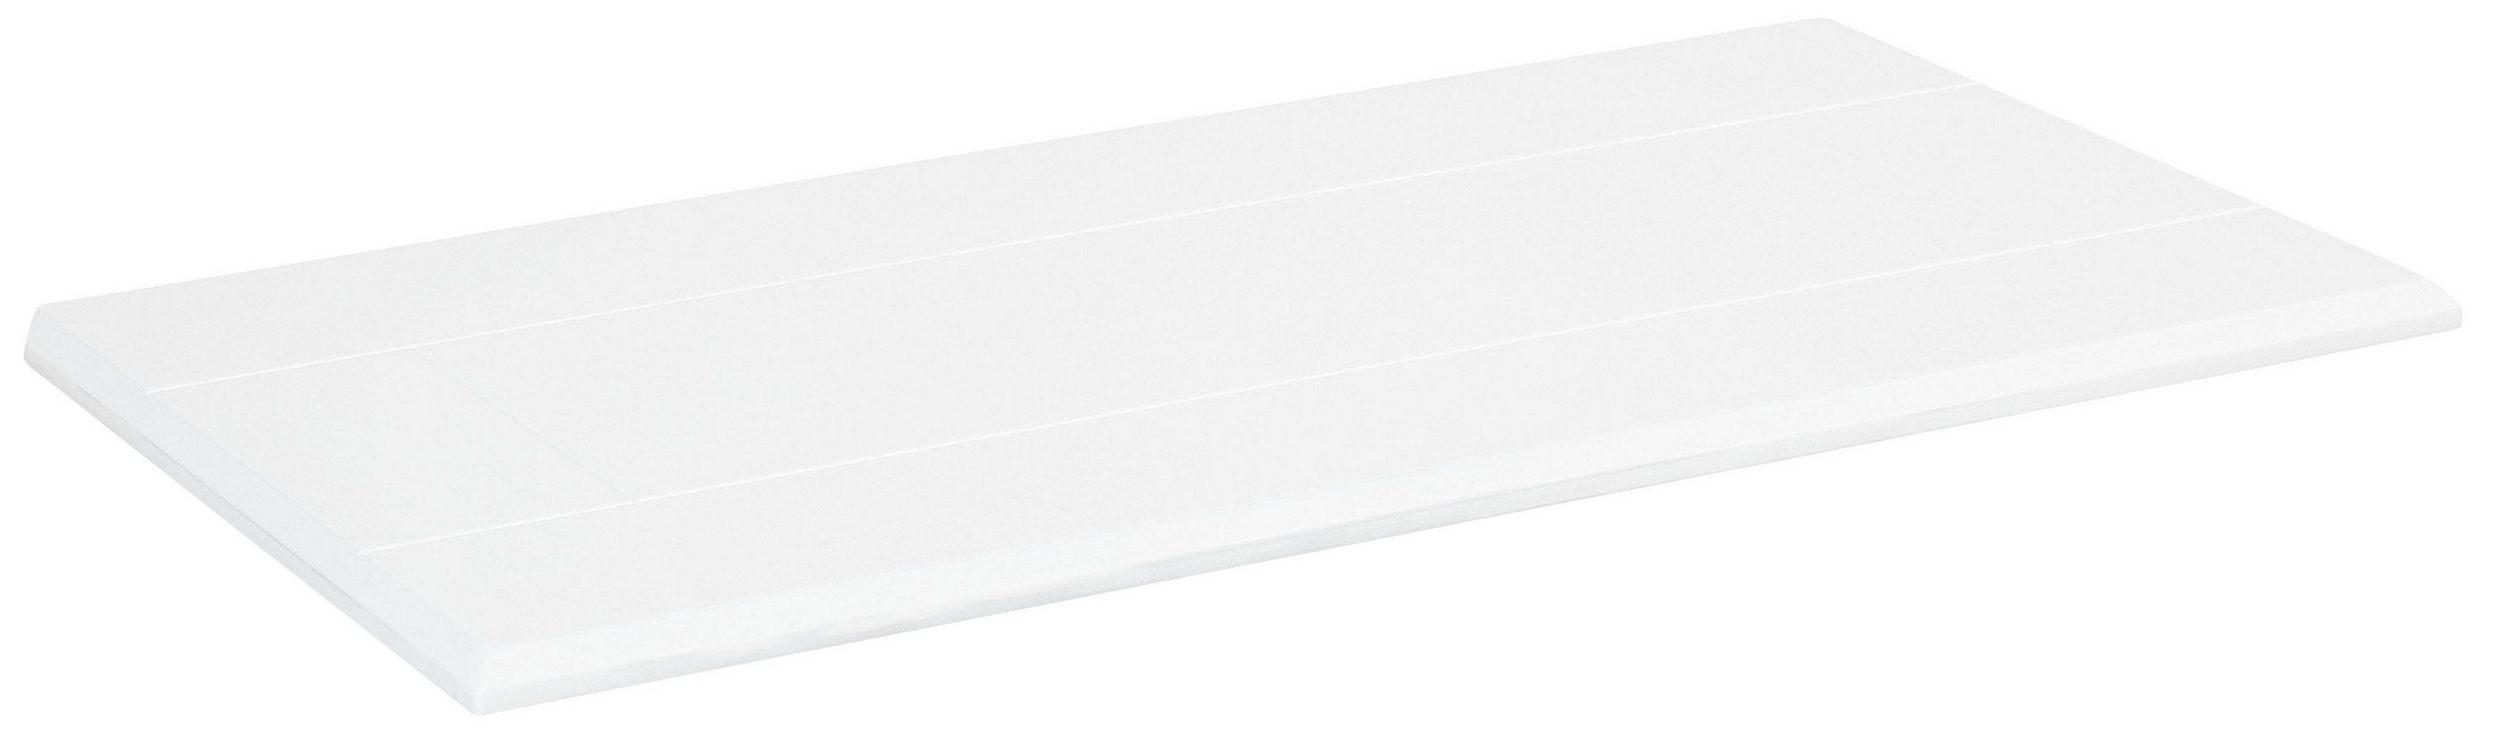 Ansteckplatte Fullerton